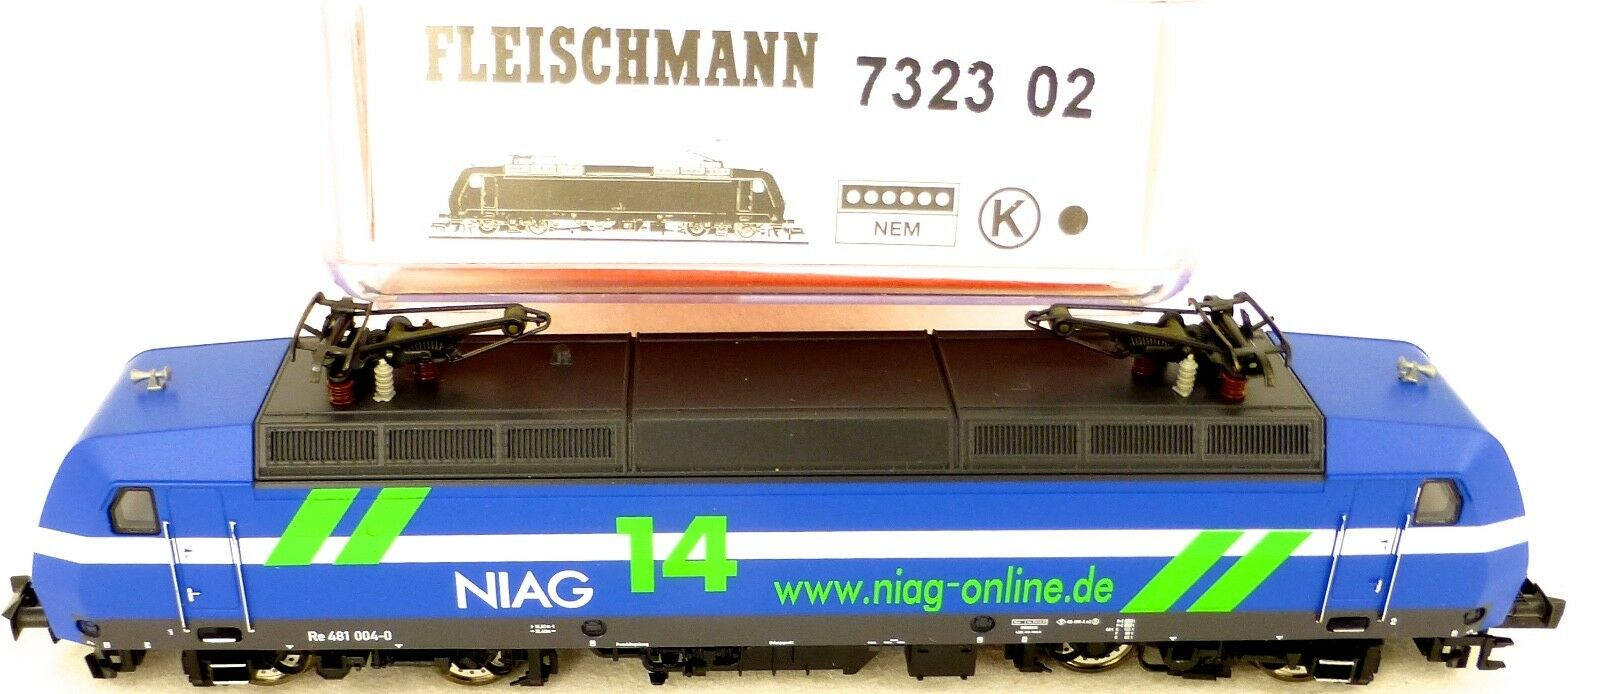 Fleischmann 7323 02 Re 481 004-0 Ellok Niag Nem N 1 160 Conf. Orig. Μ